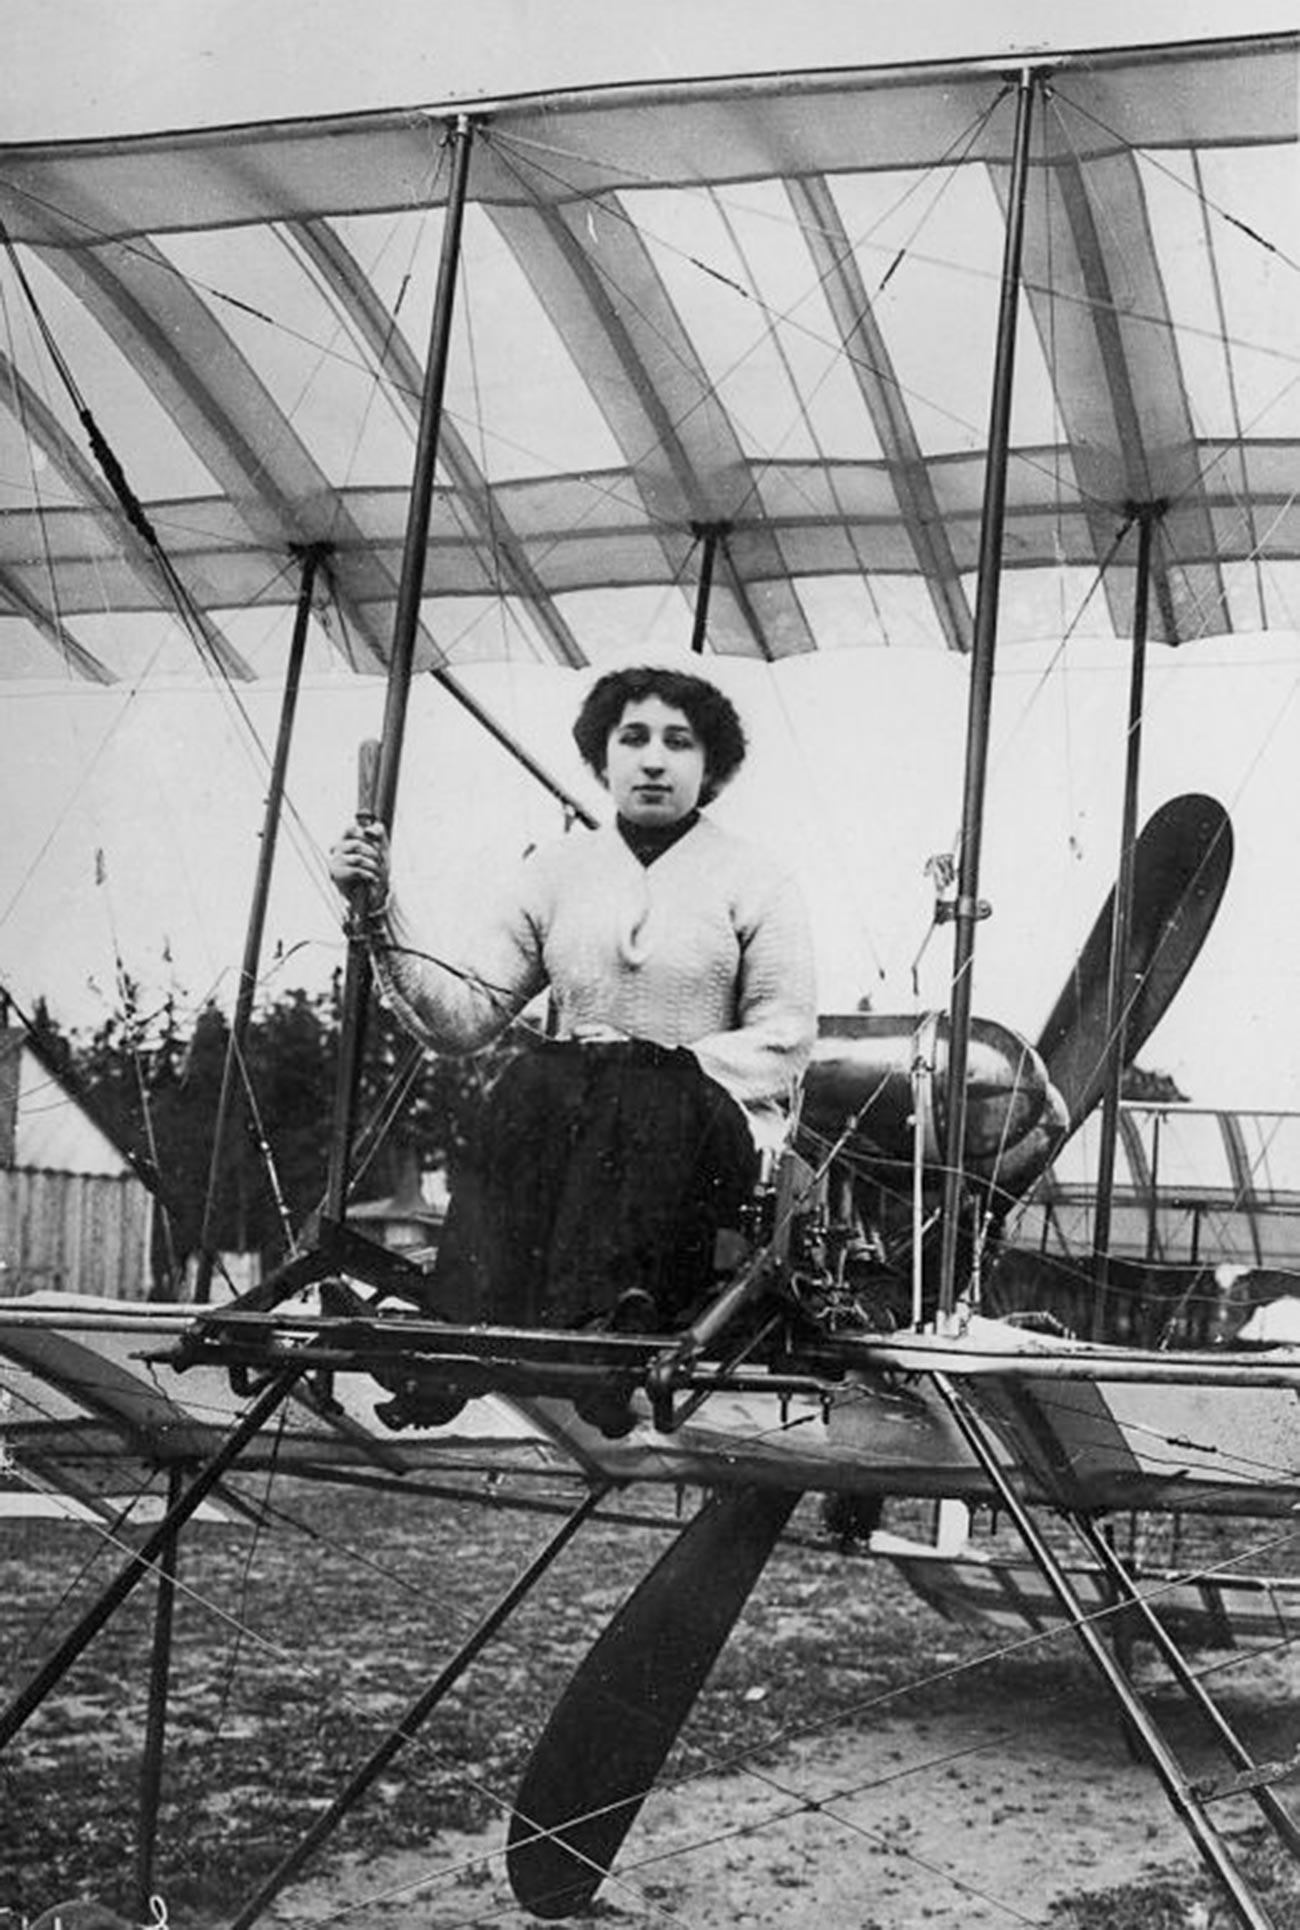 Prva ruska pilotkinja Lidija Zvereva u